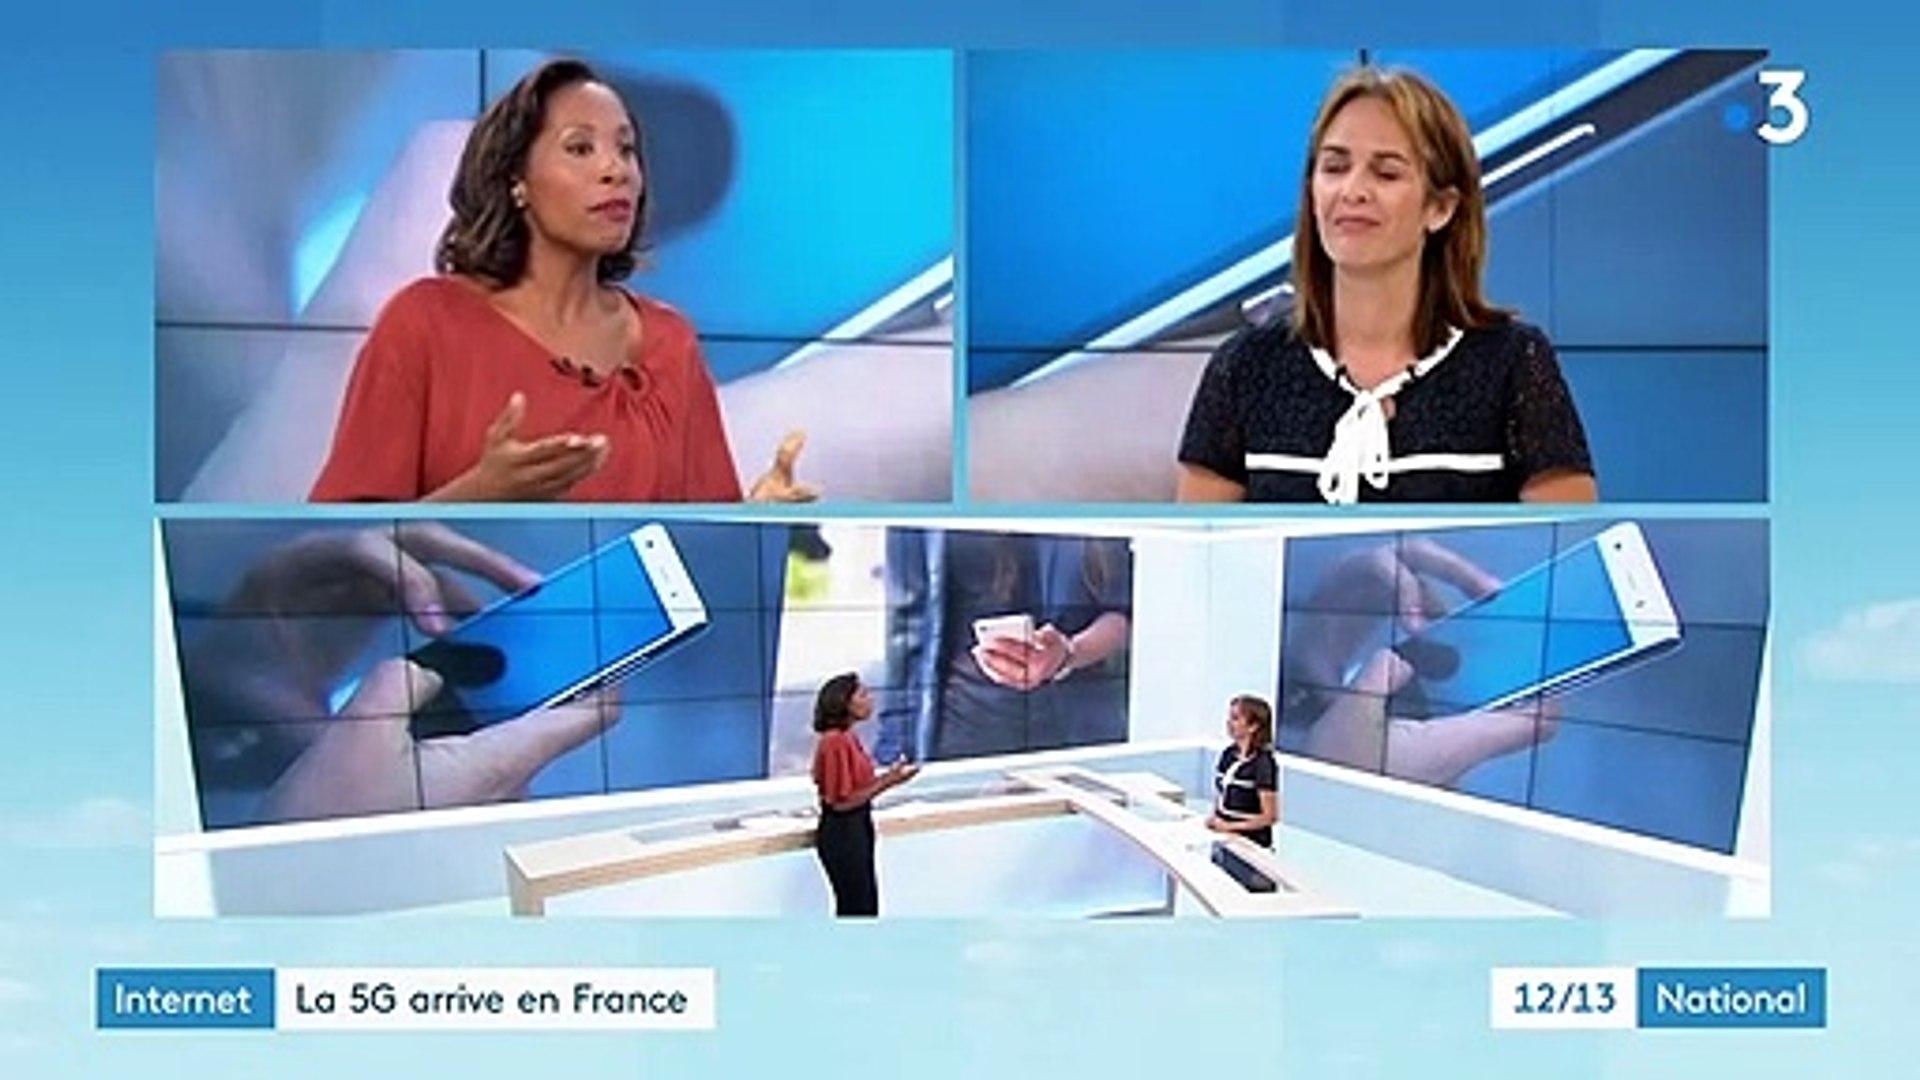 Internet : la 5G arrive en France